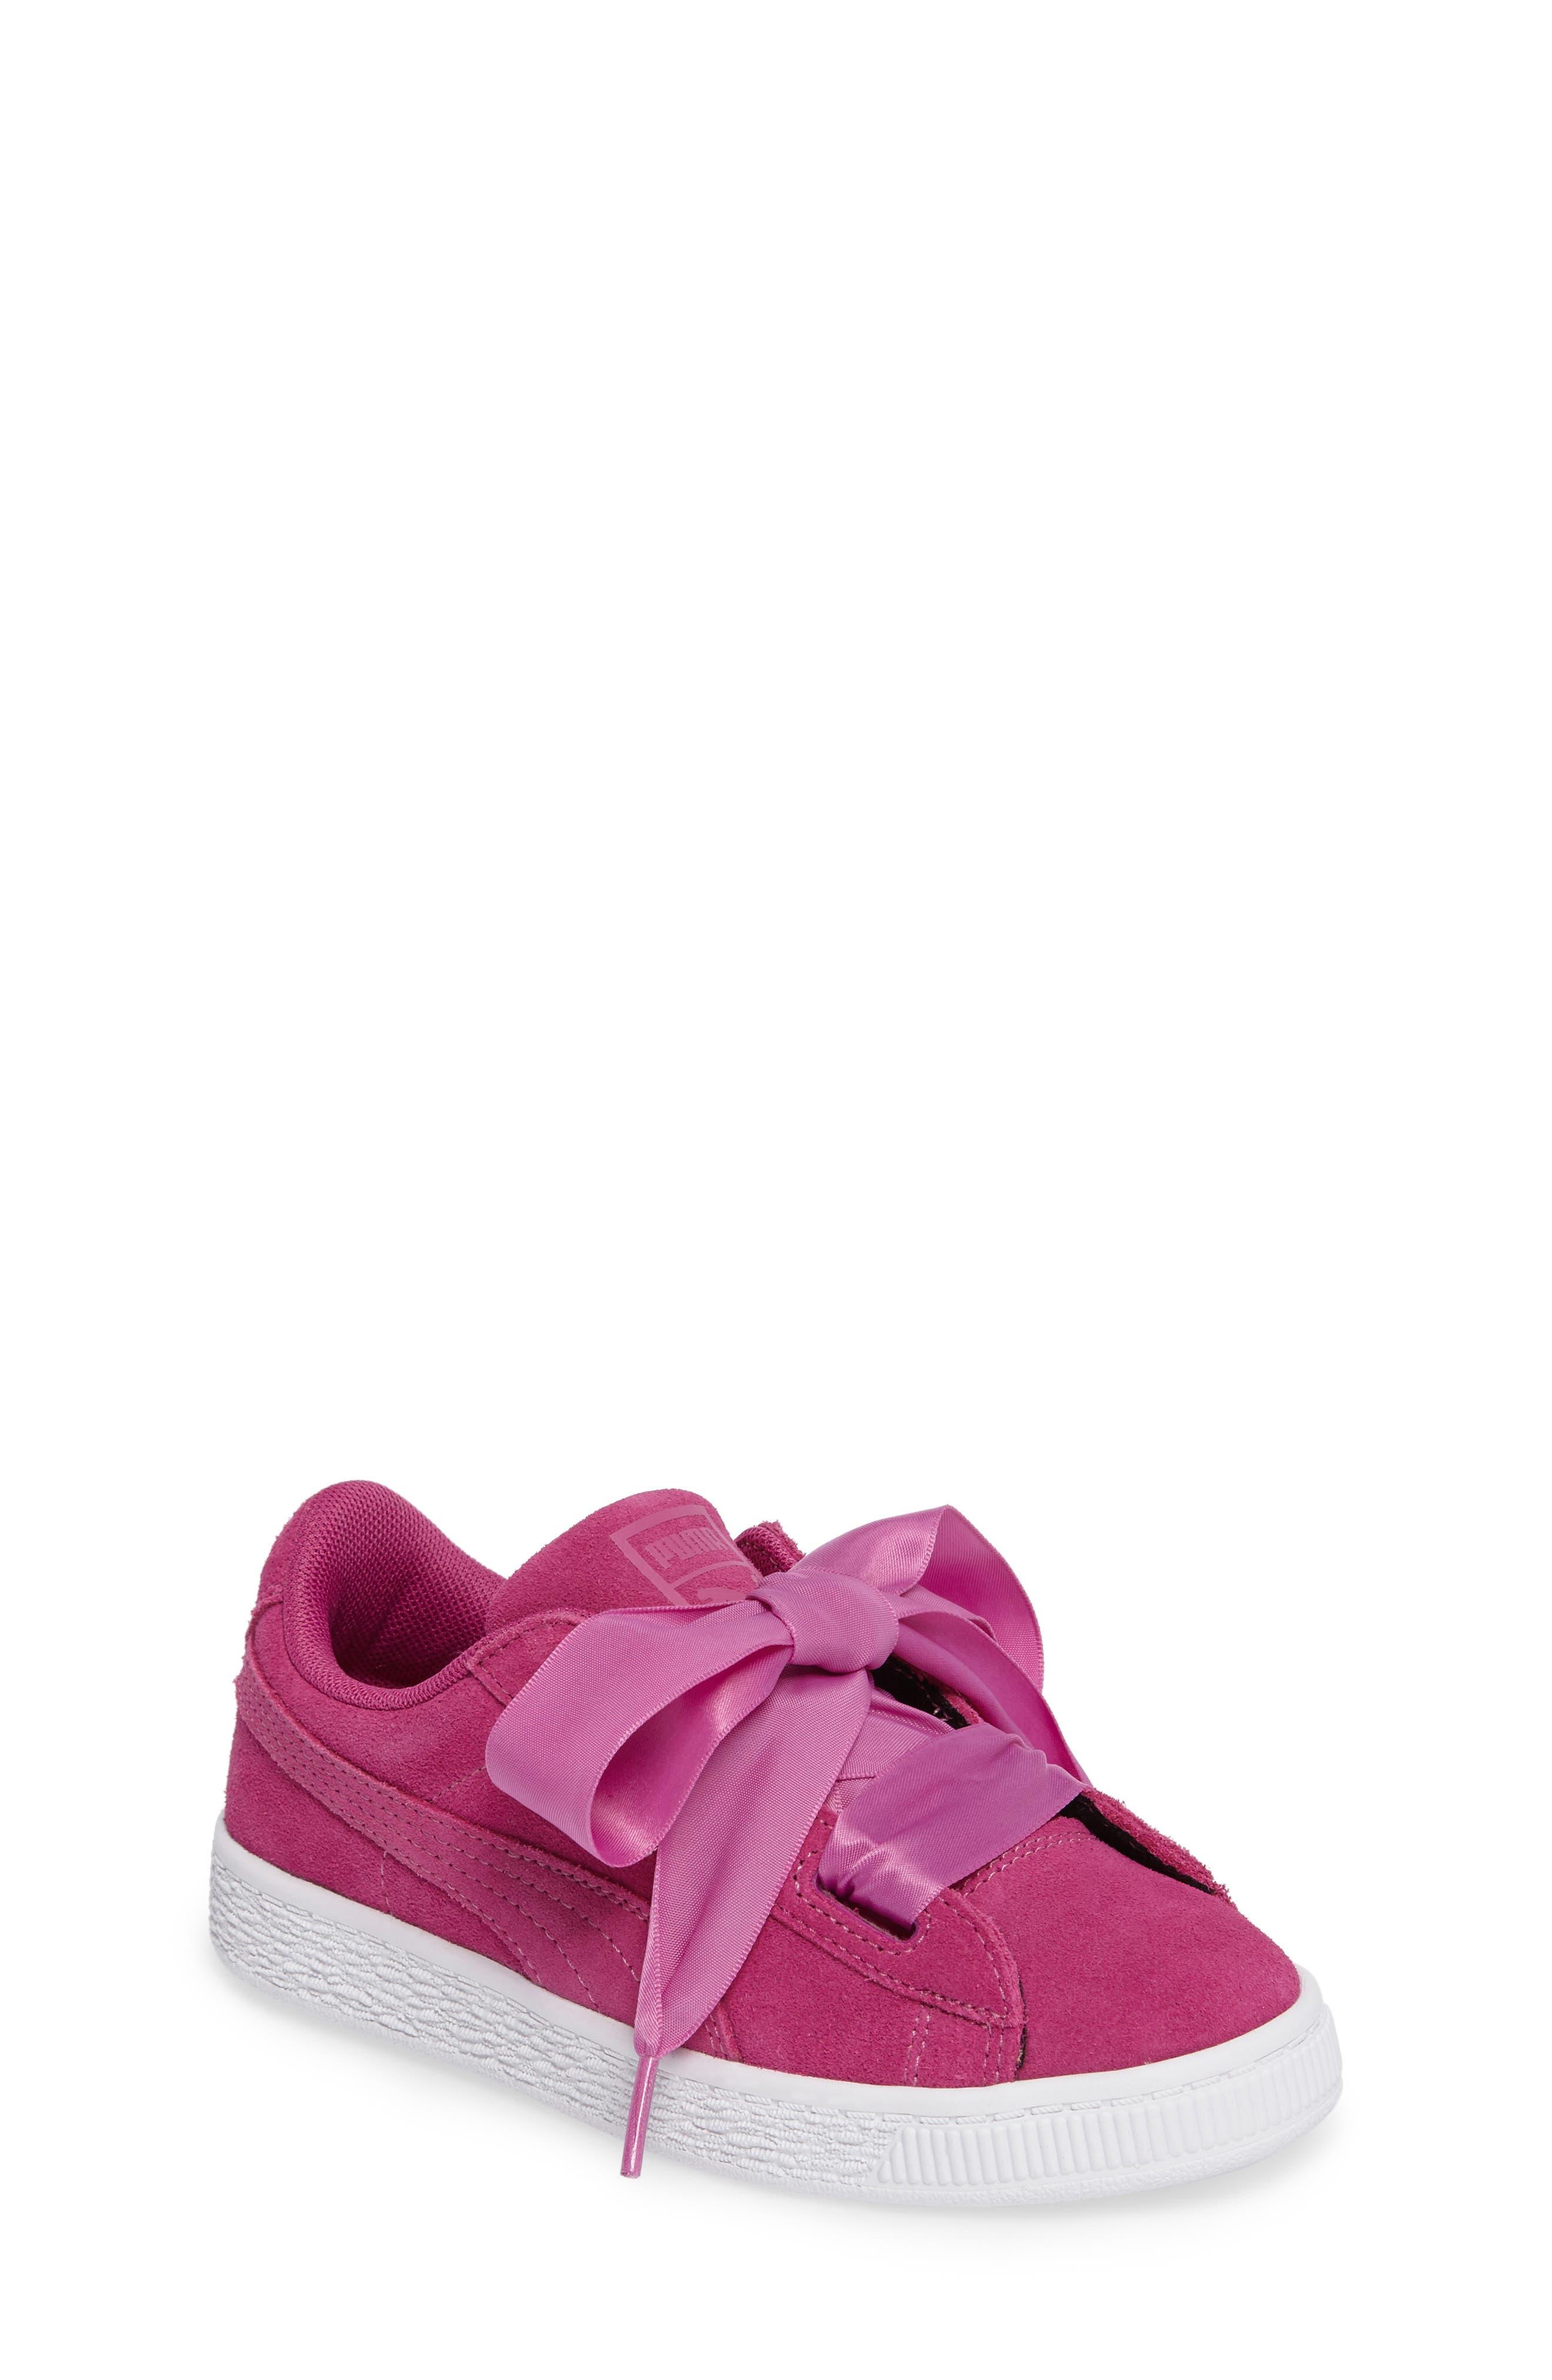 Puma Hearts Sneaker (Toddler, Little Kid & Big Kid)